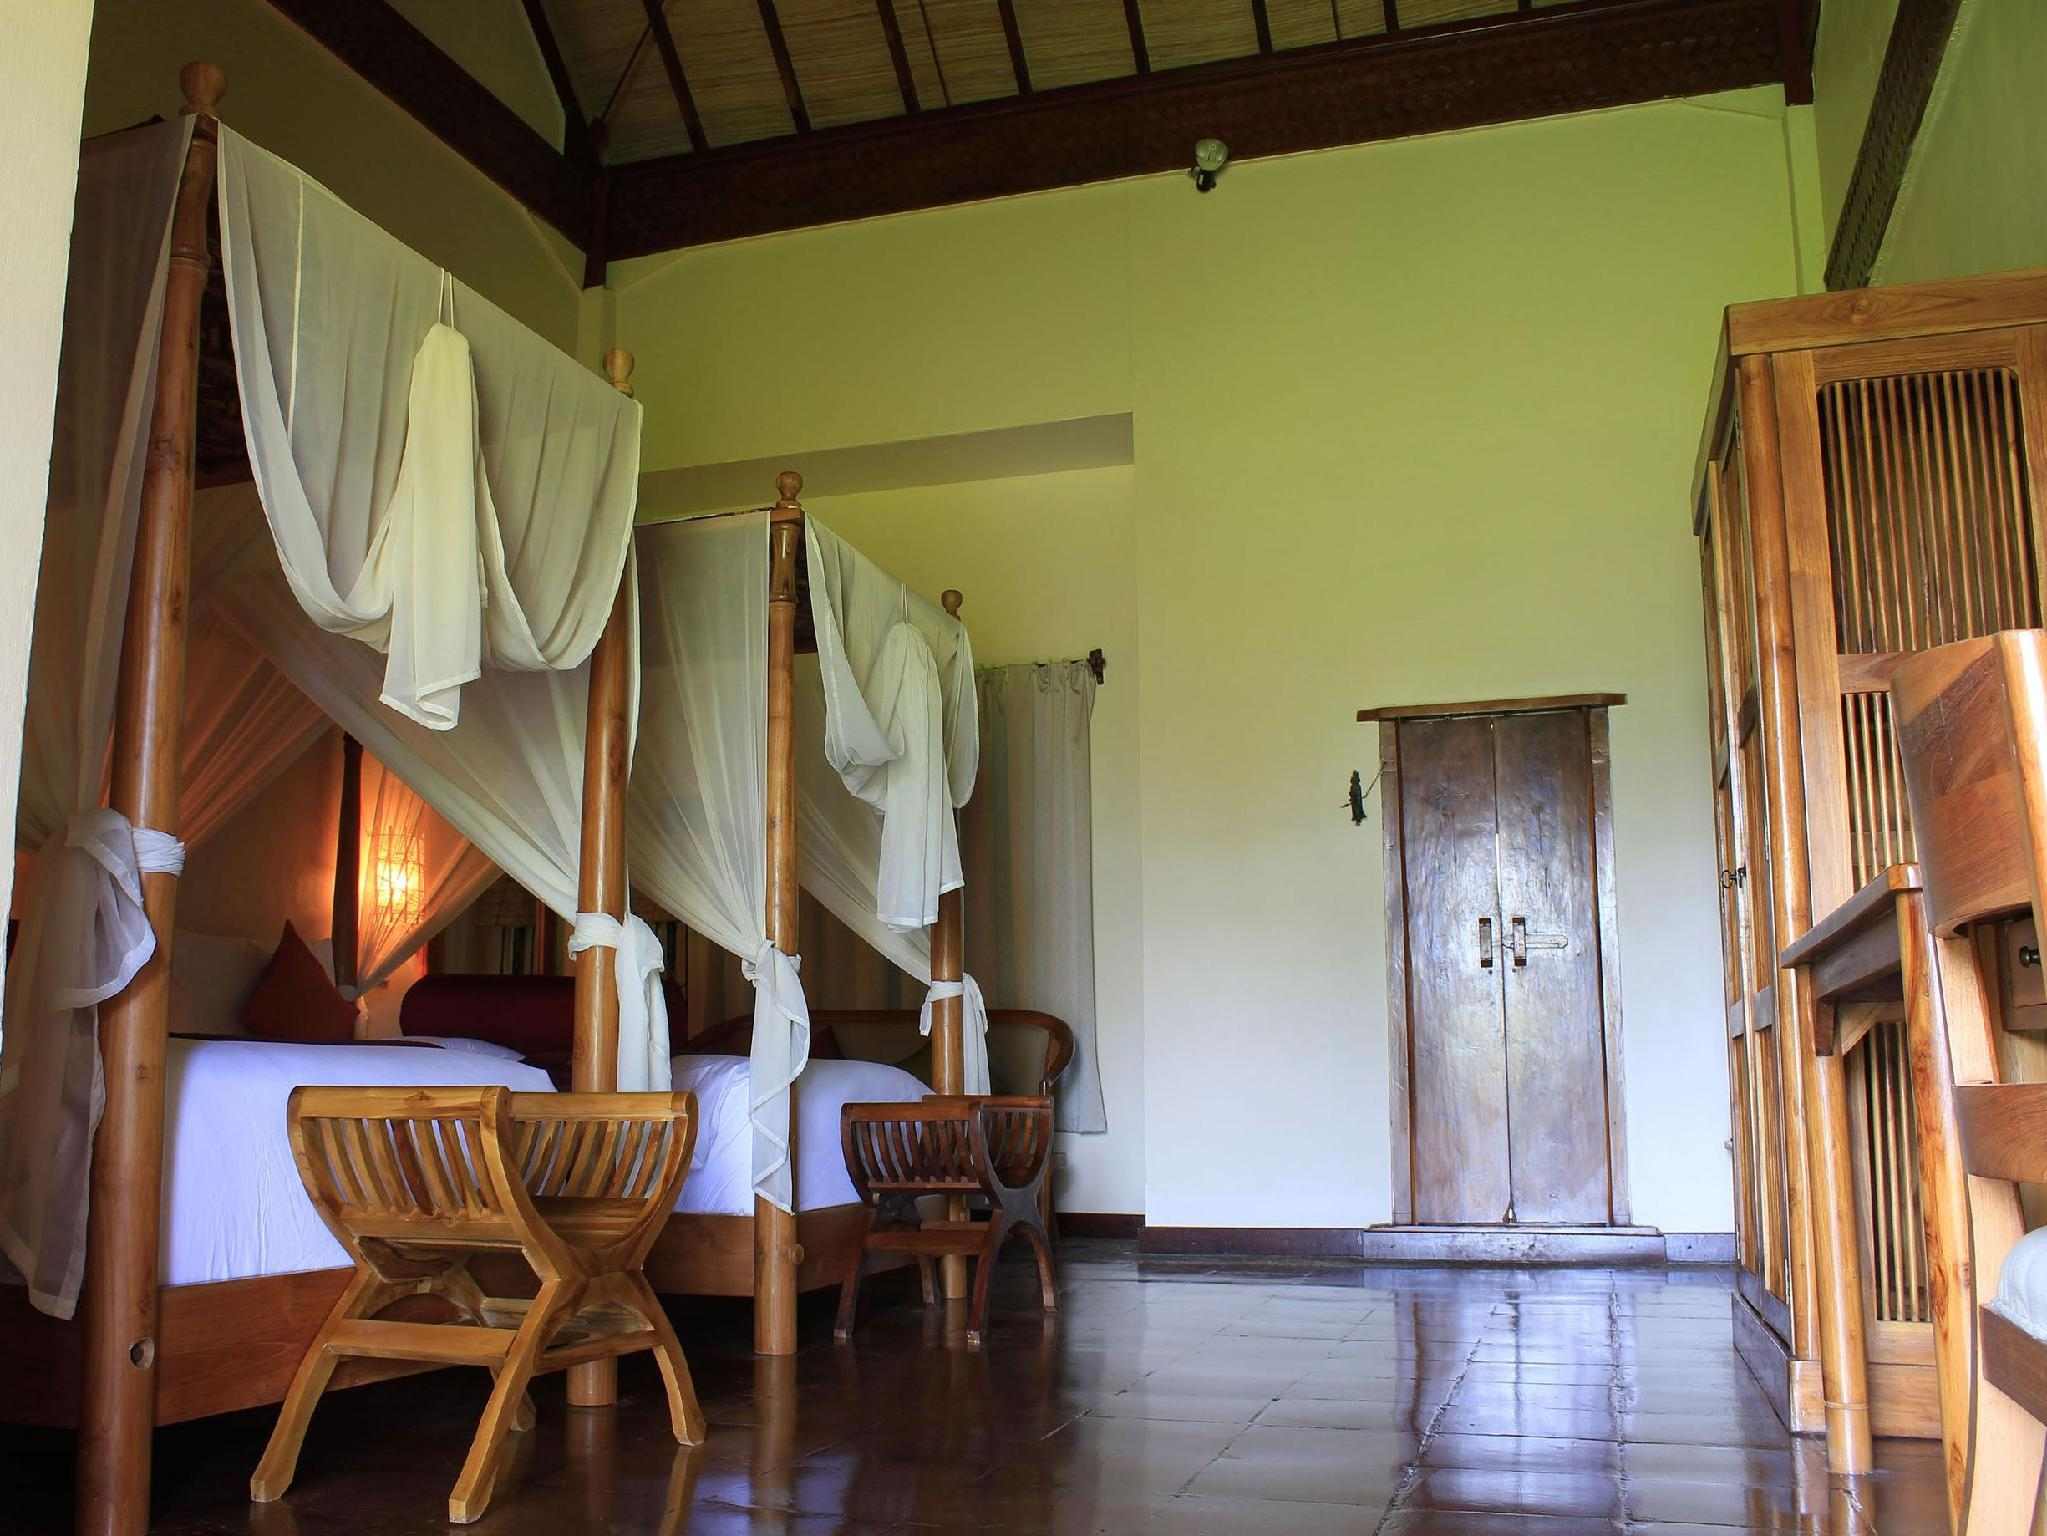 Junjungan Ubud Hotel & Spa, Gianyar